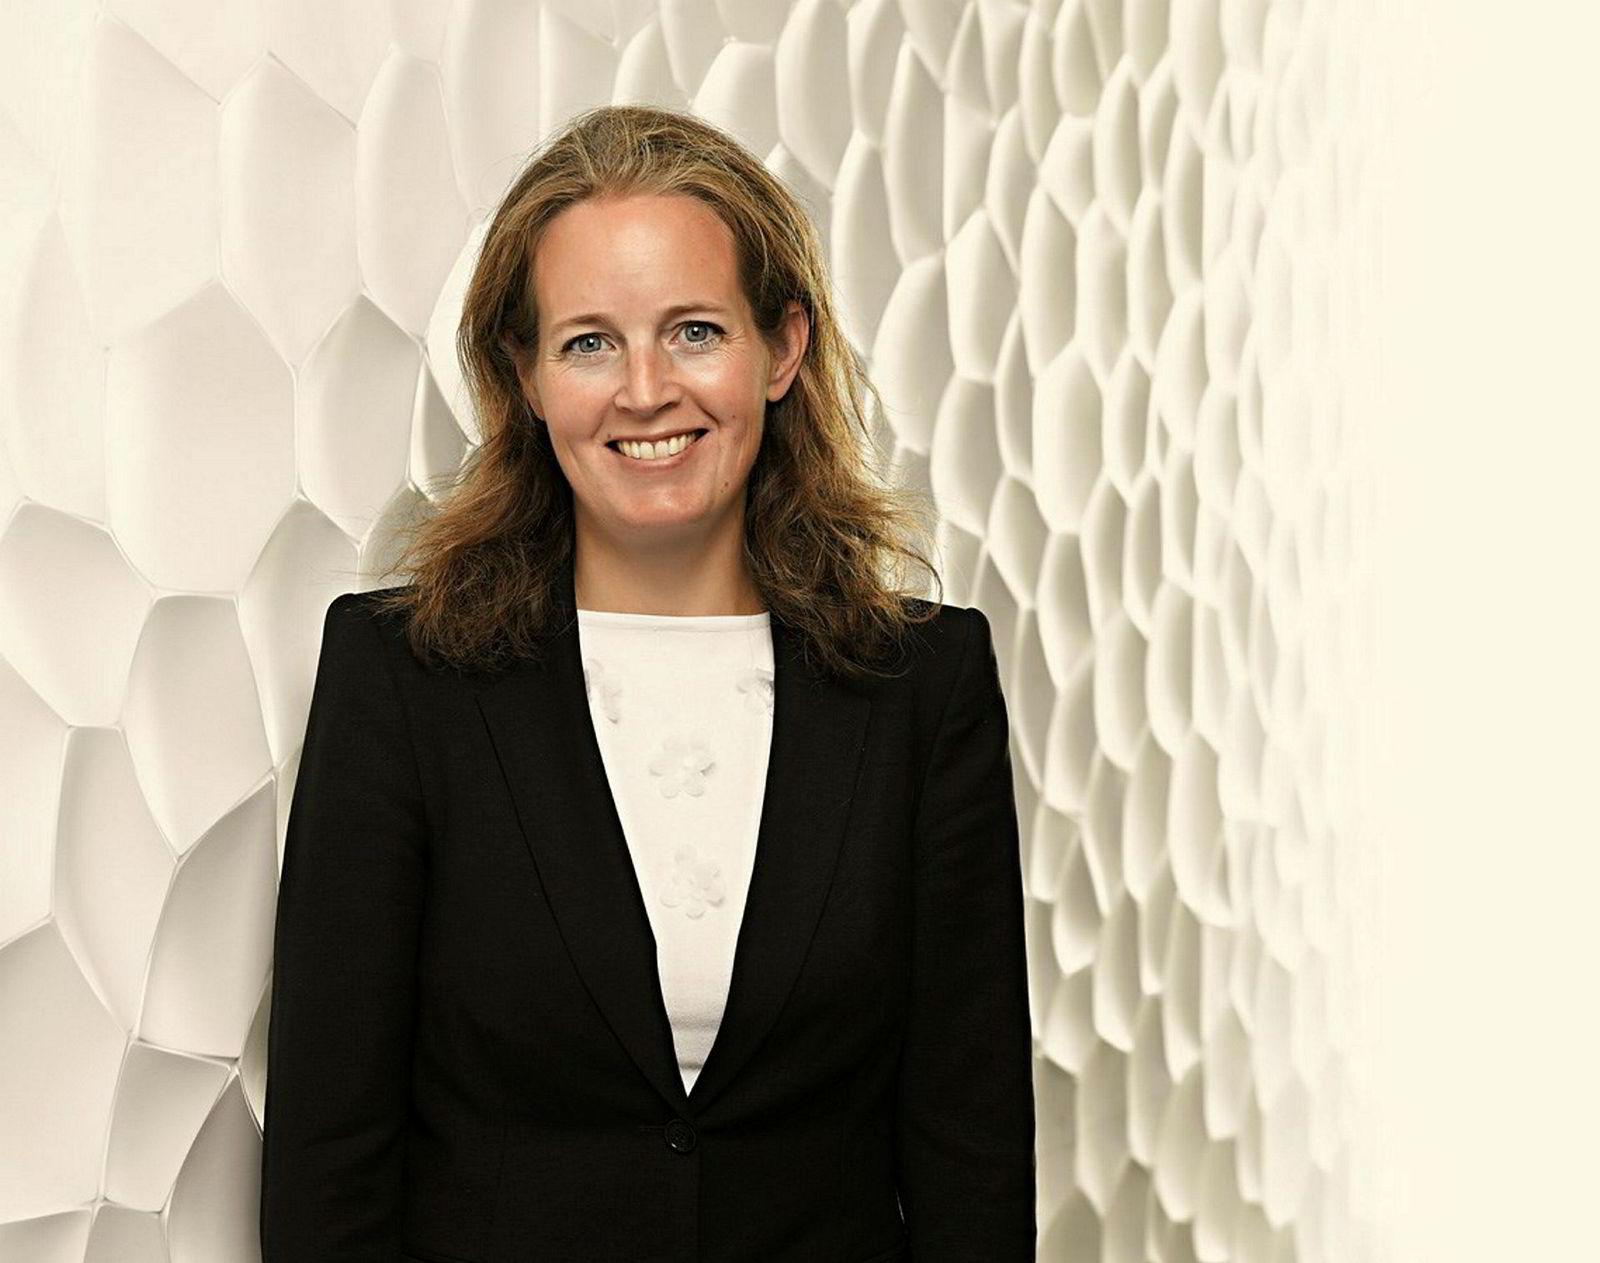 Advokat Karin Fløistad i Simonsen advokatfirma, skal lede den nye Konkurranseklagenemnda